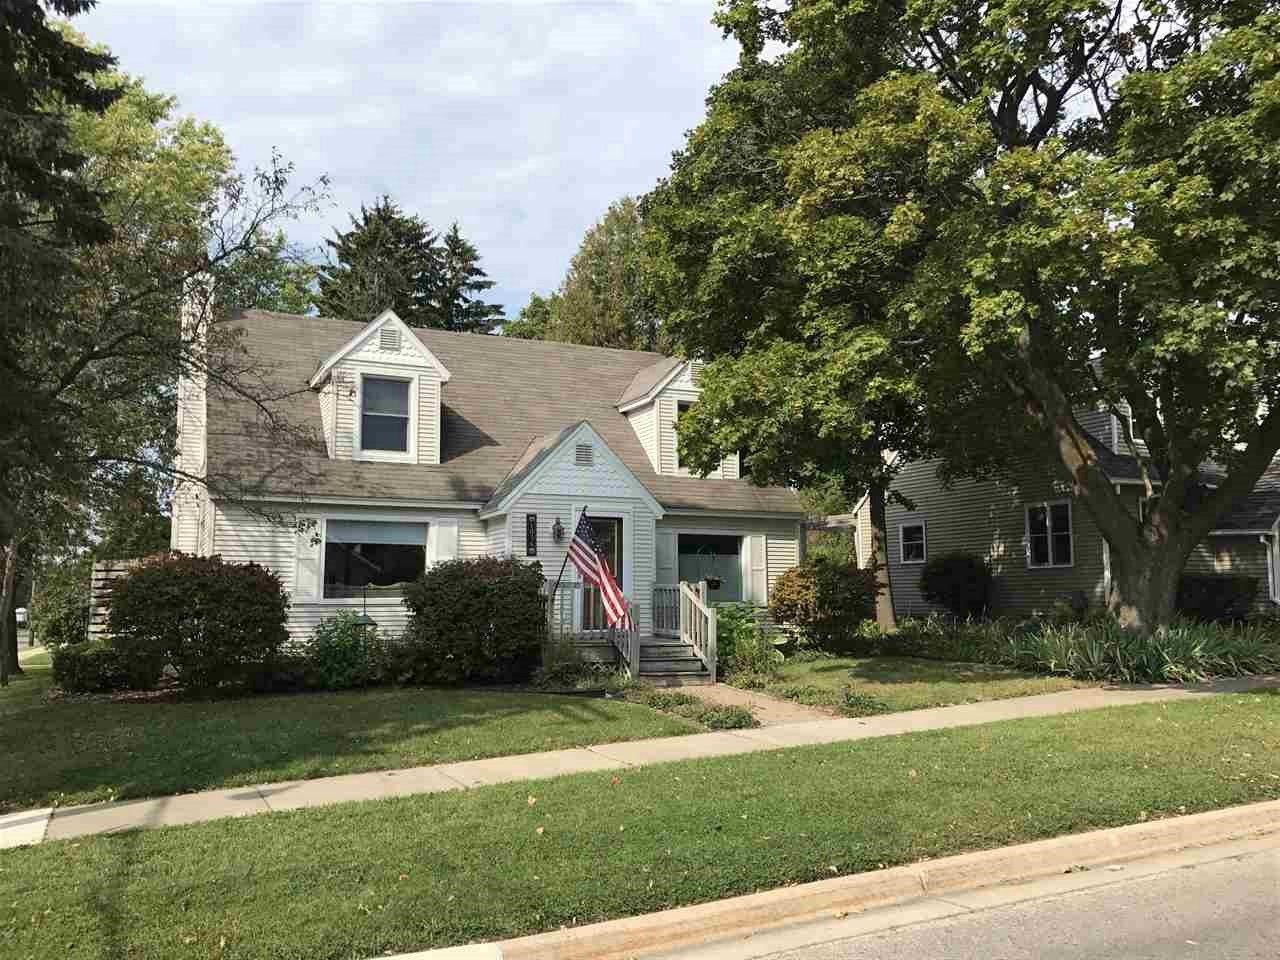 Petoskey Mi Single Family Home Sold 195 000